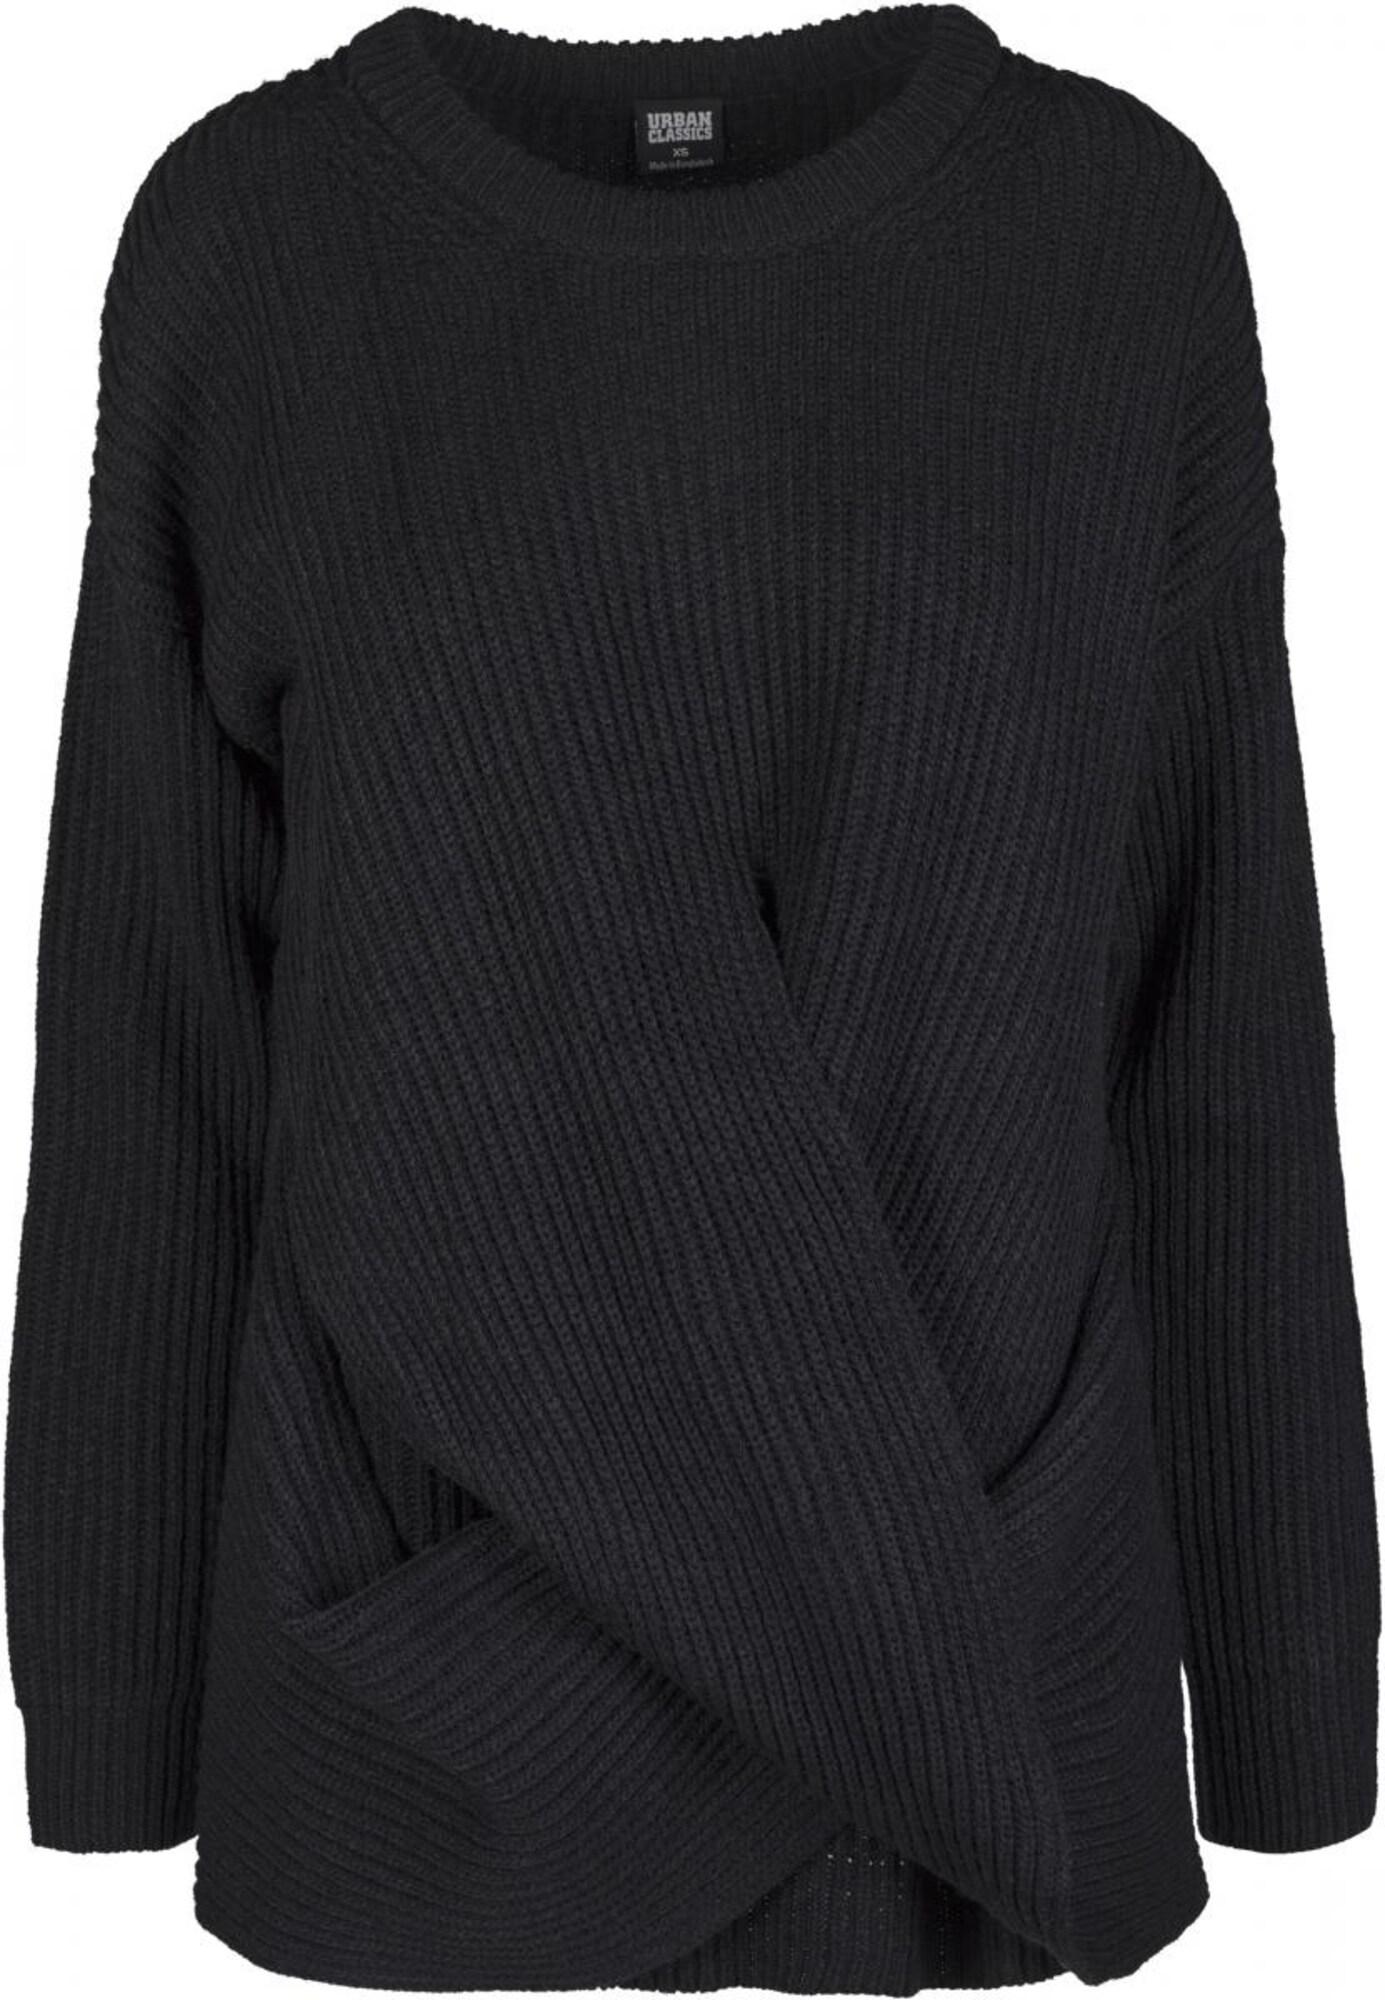 Svetr Ladies Wrapped Sweater černá Urban Classics Curvy